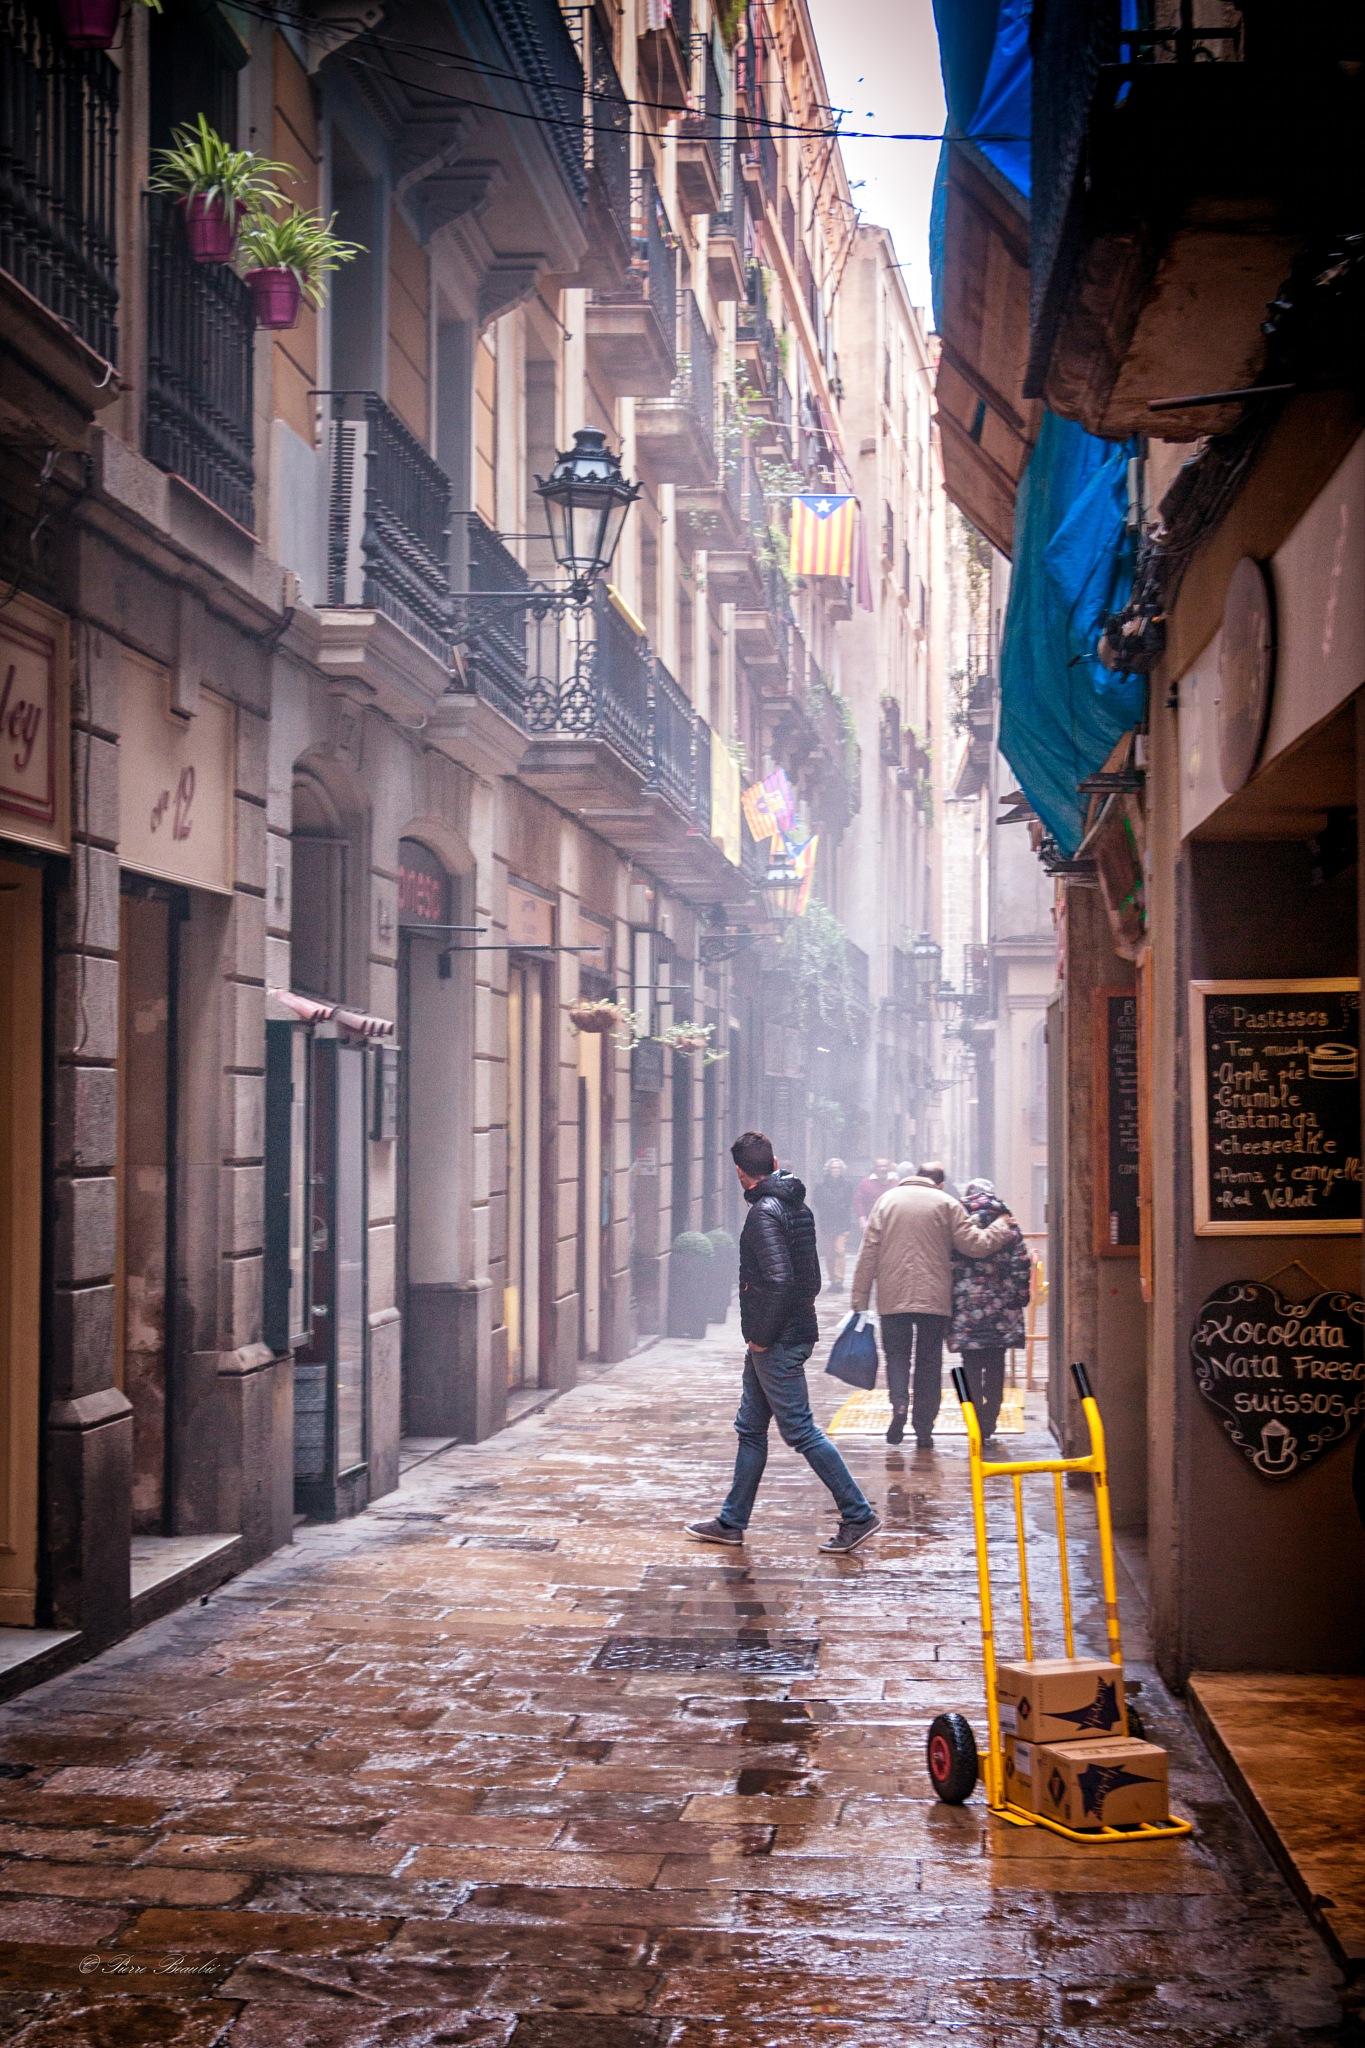 Rainy day in Barcelona by Pierre Beaubié